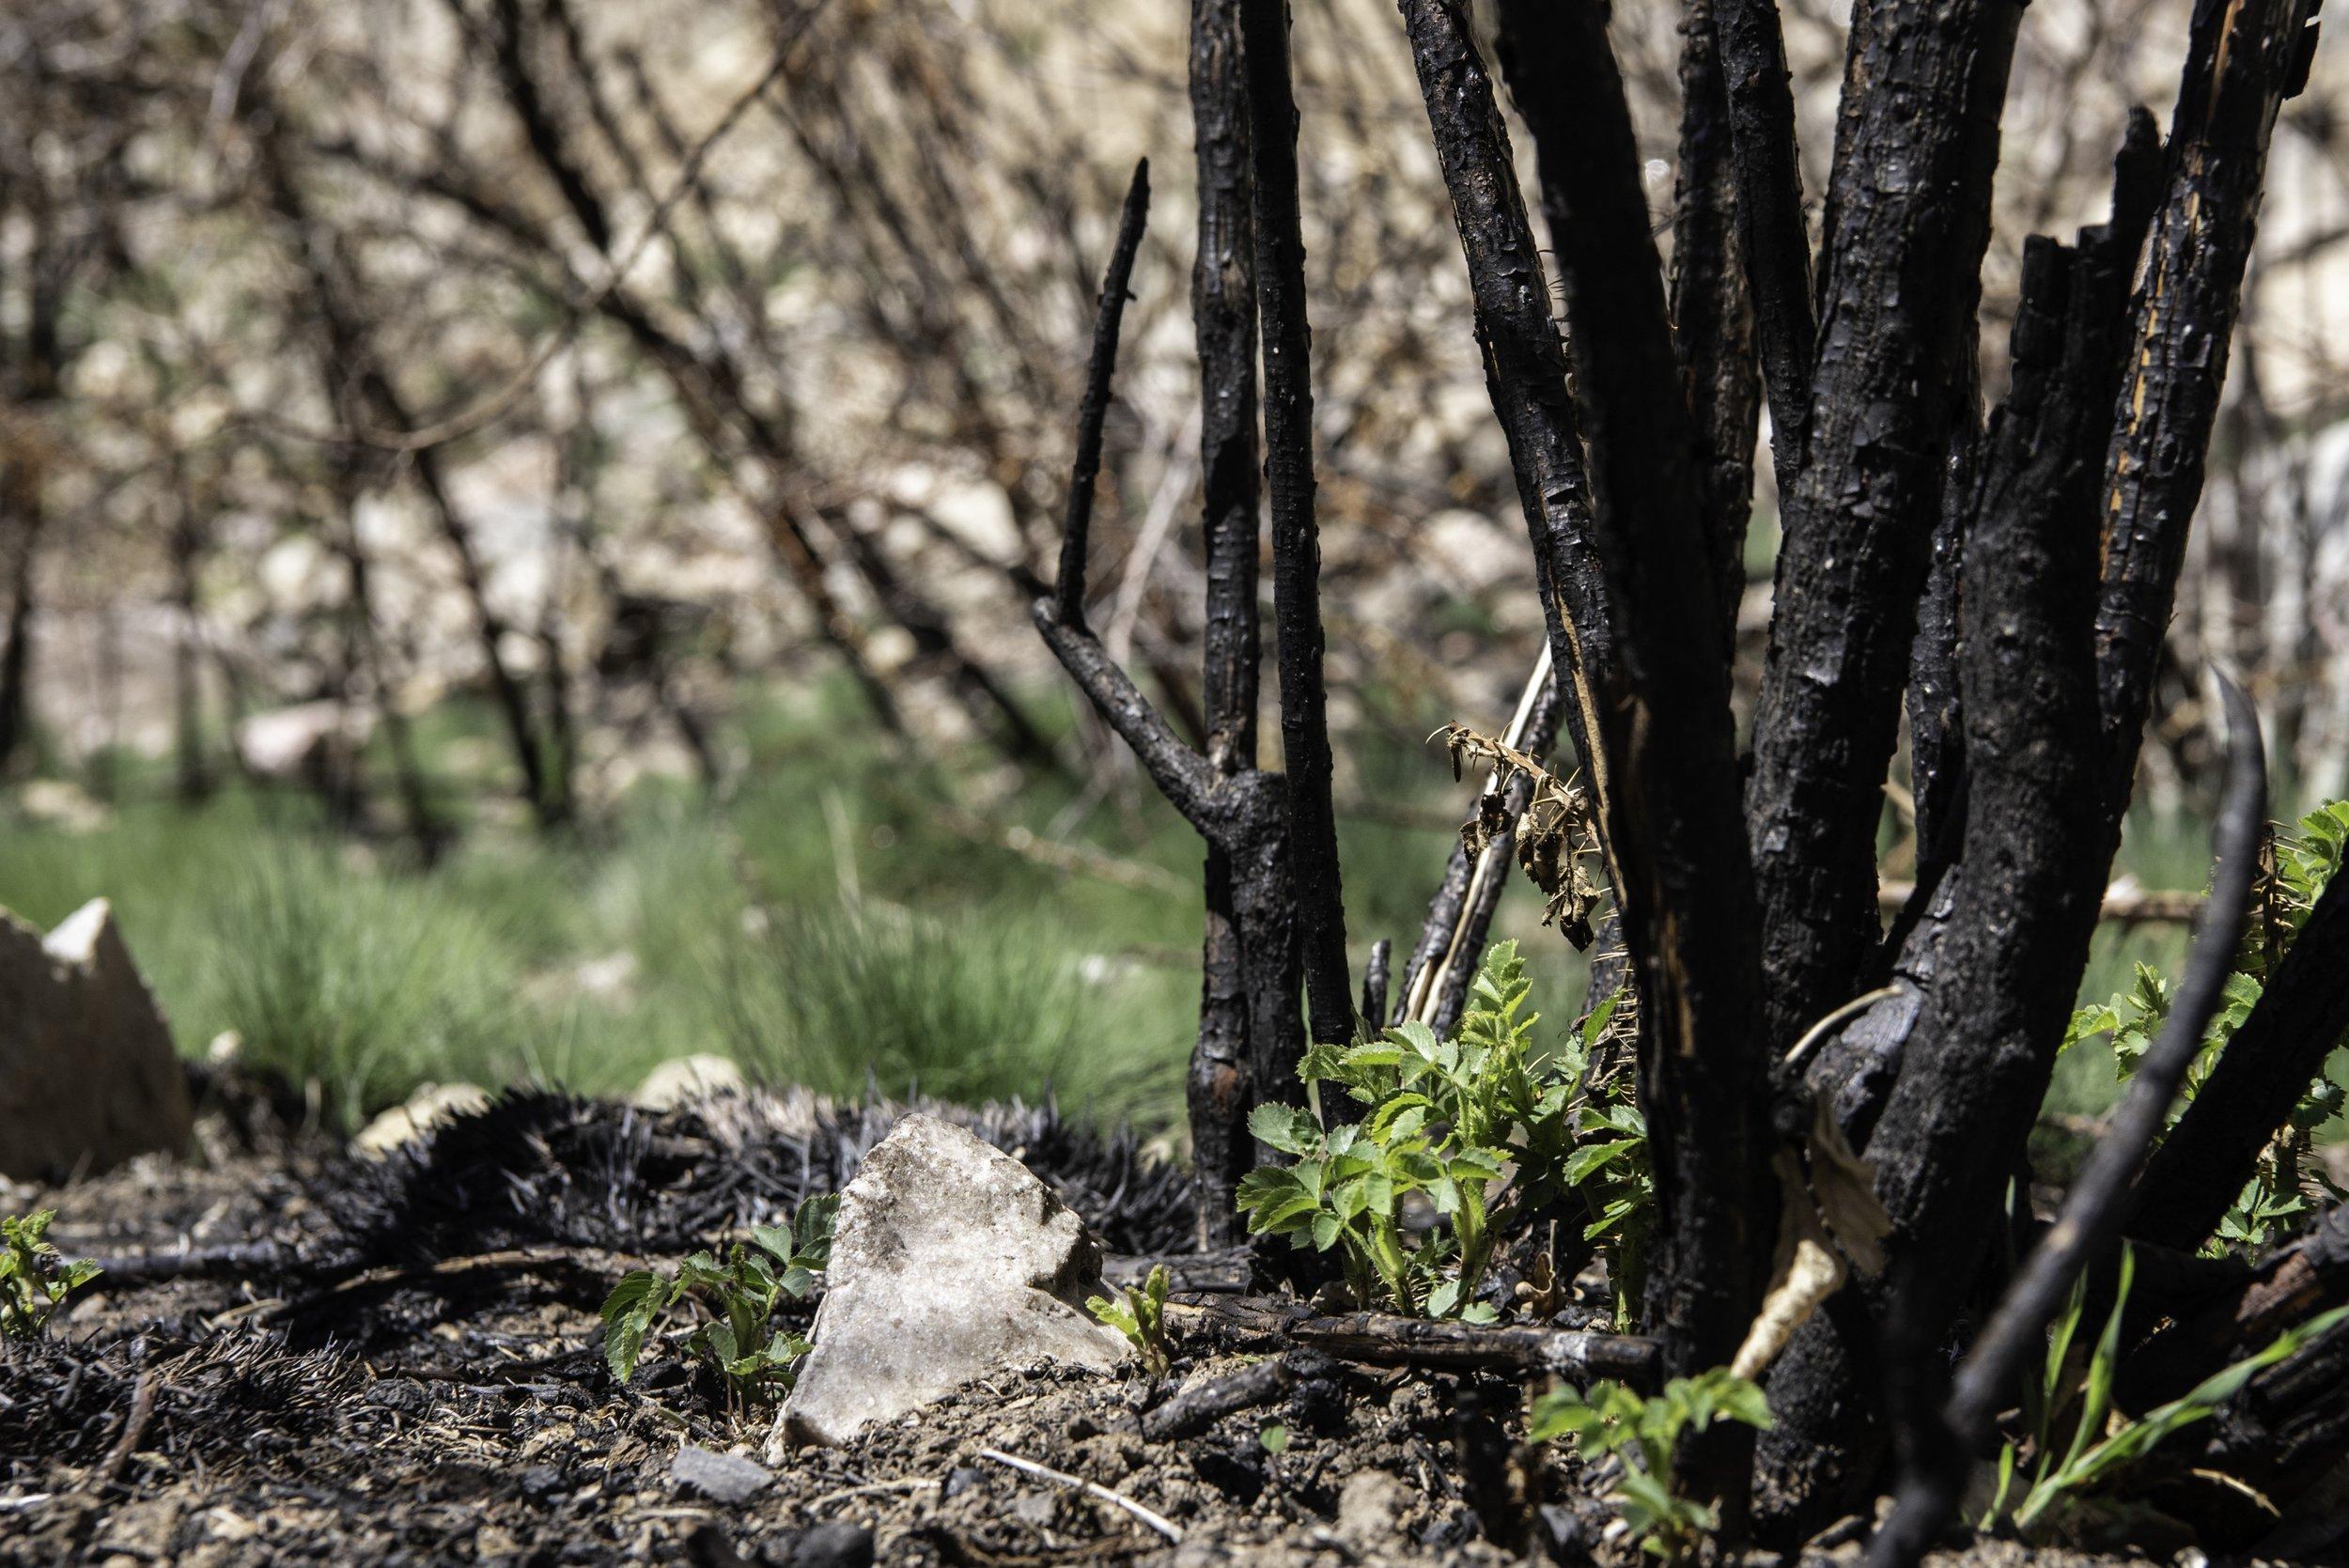 Post-burn, life returns at Hanging Lake thumbnail